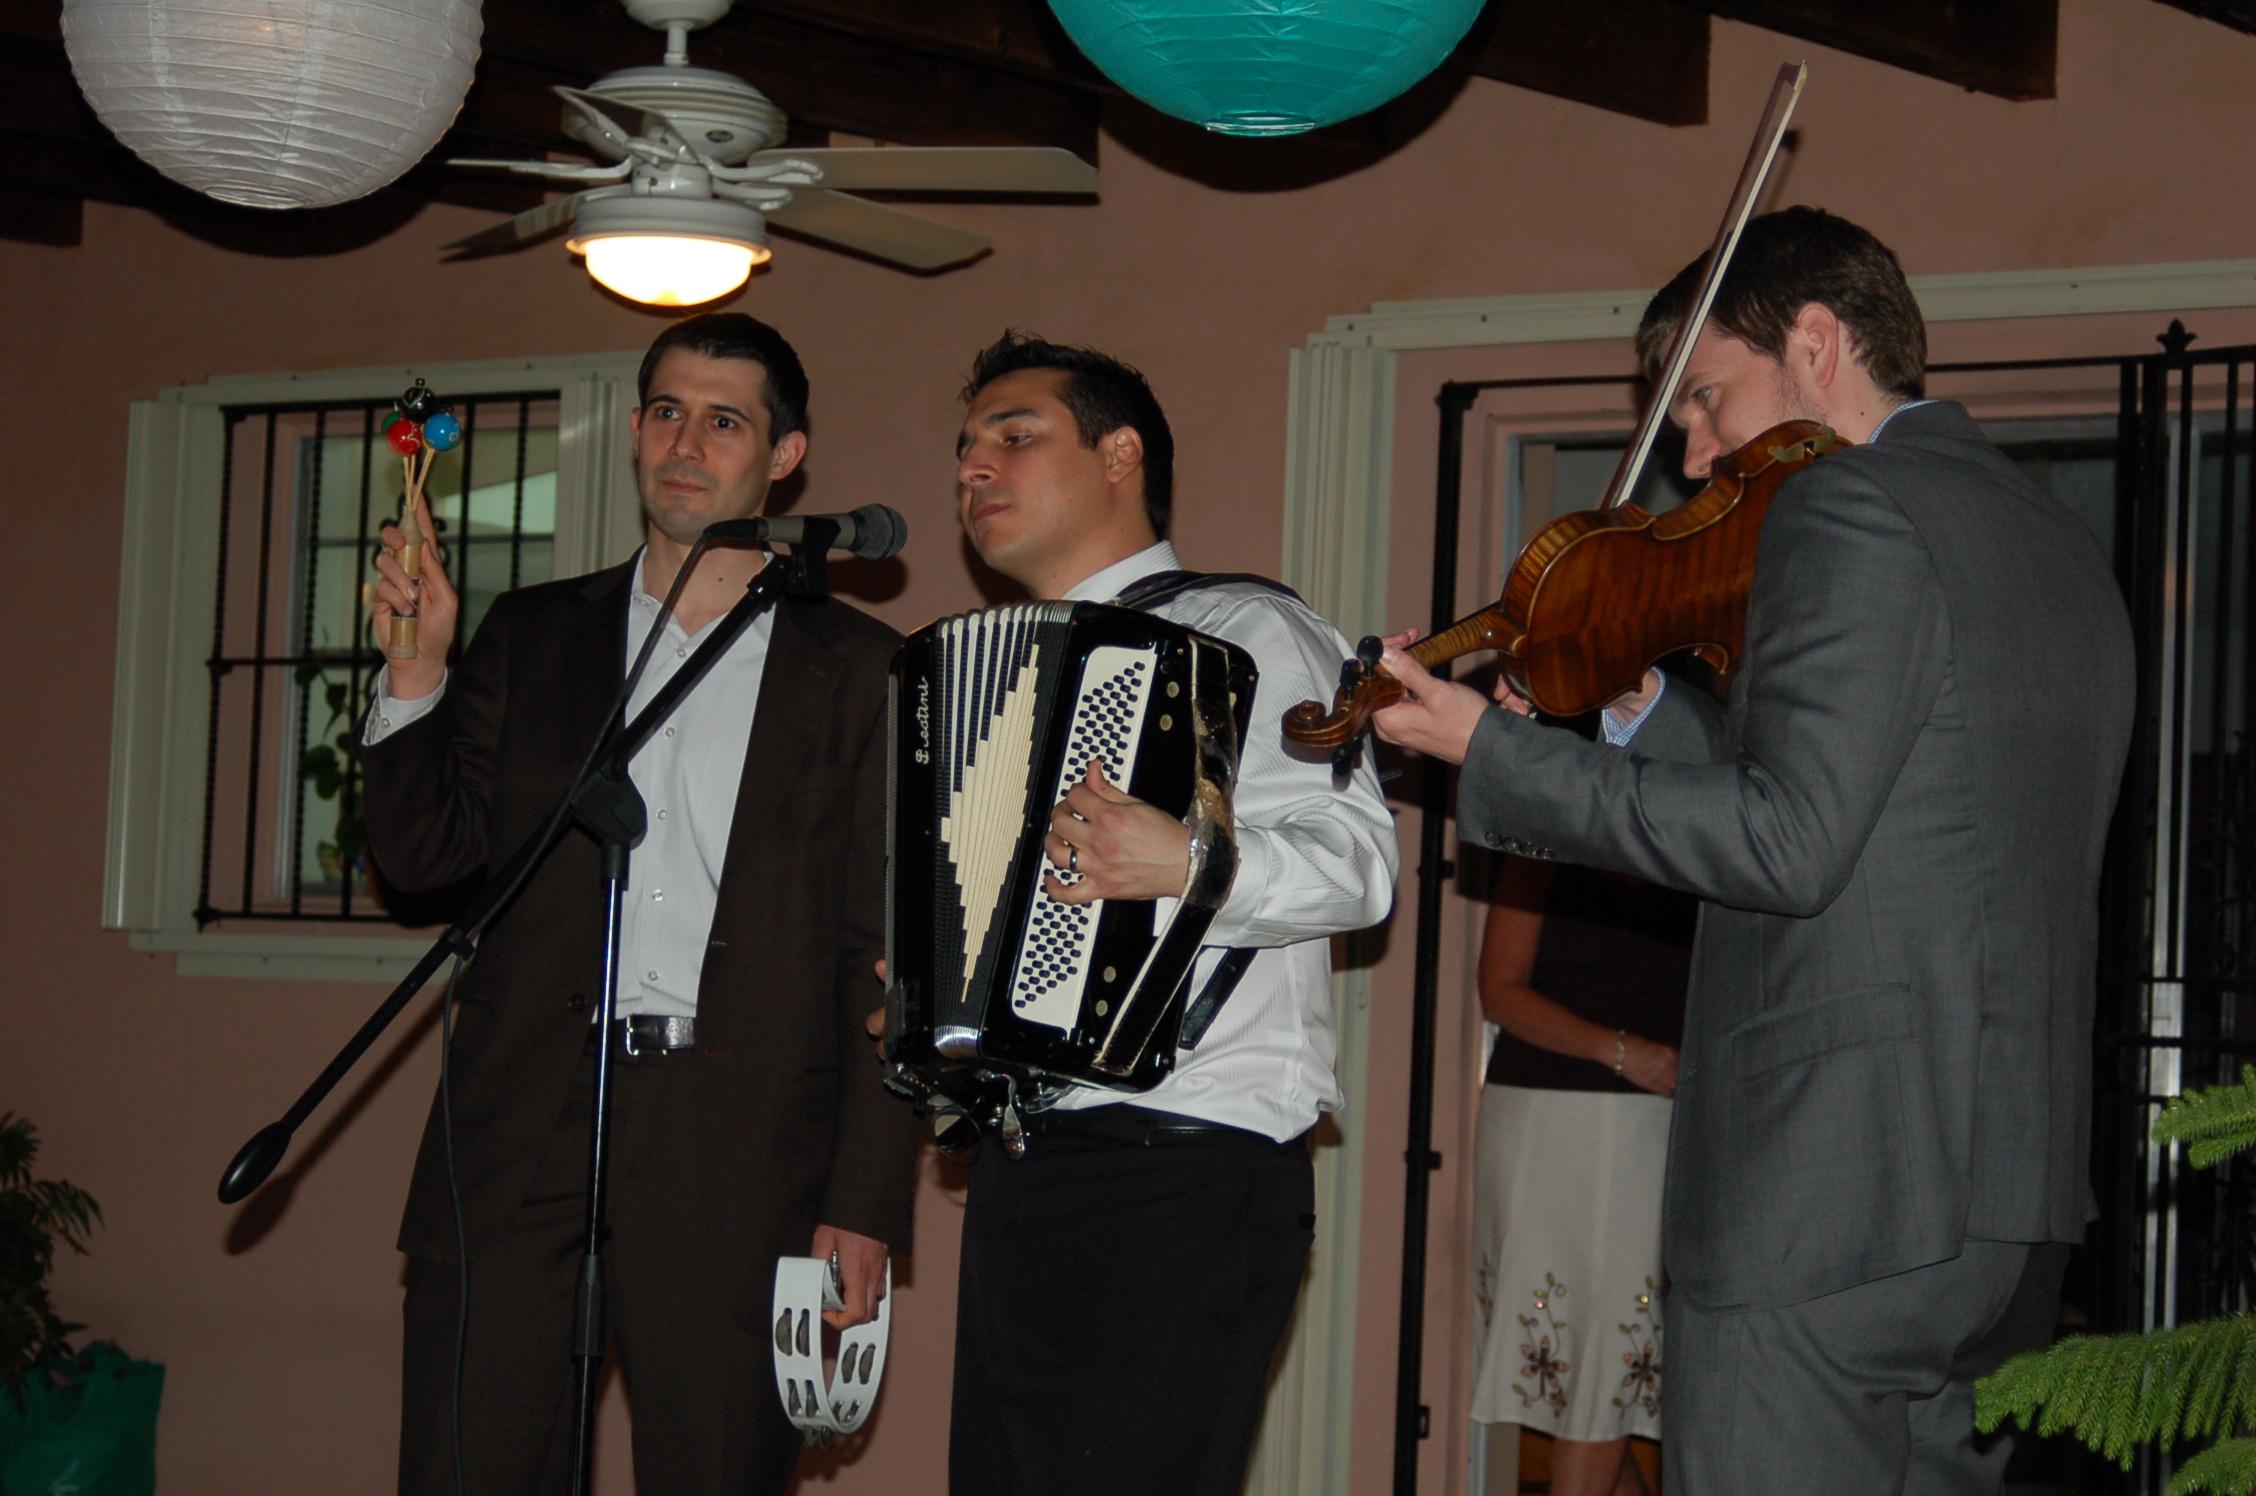 Soler-Ballio wedding - Miami, FL